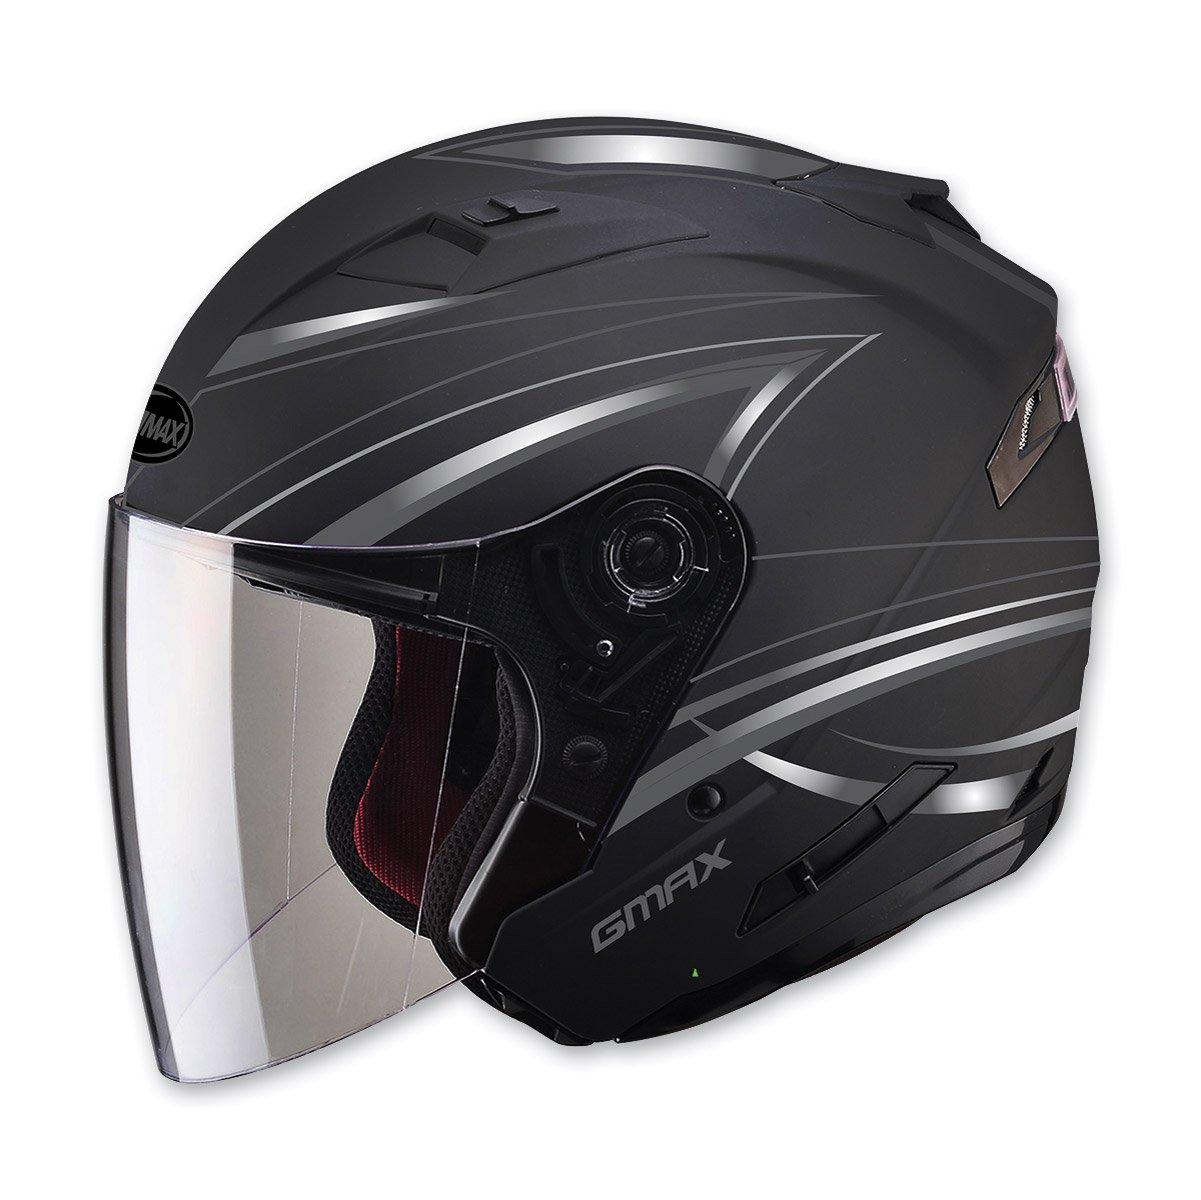 GMAX unisex-adult open-face-helmet-style Helmet (Of77 Derk) (Flat Black/Silver, Medium)